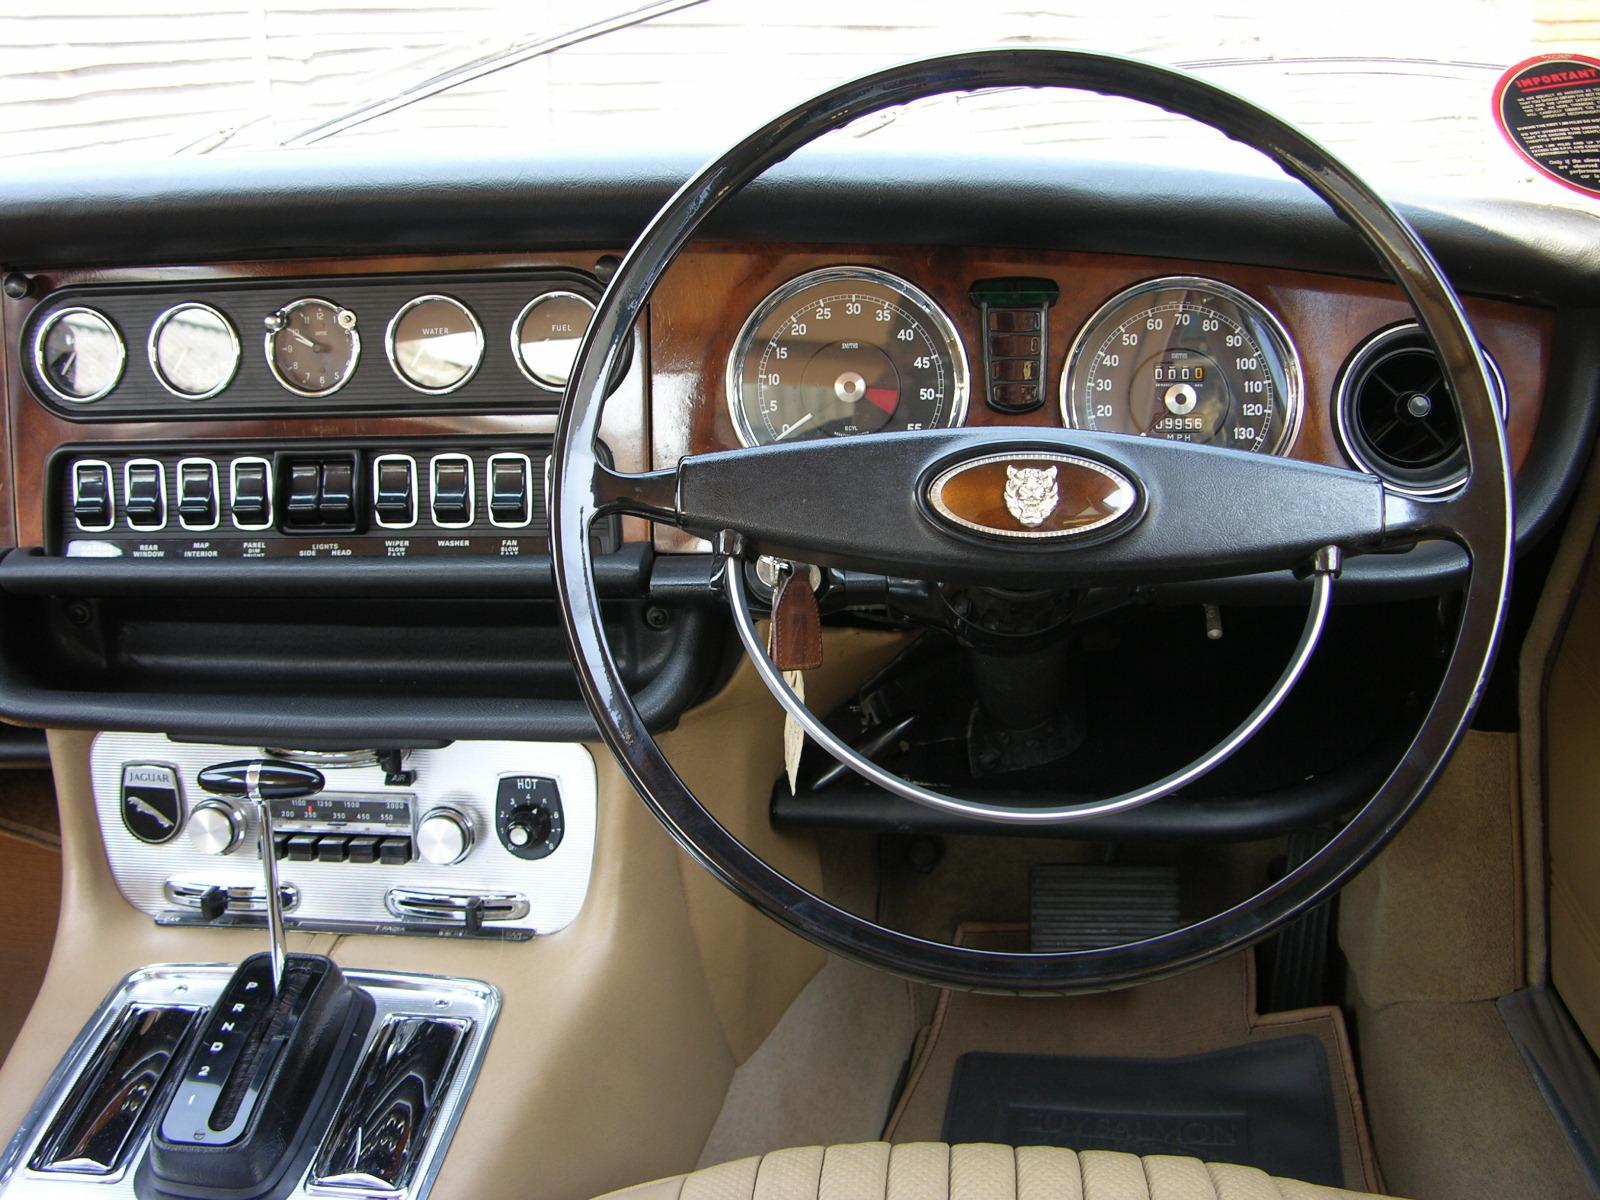 Jaguar XJ I (Series 1) 1968 - 1973 Sedan #4